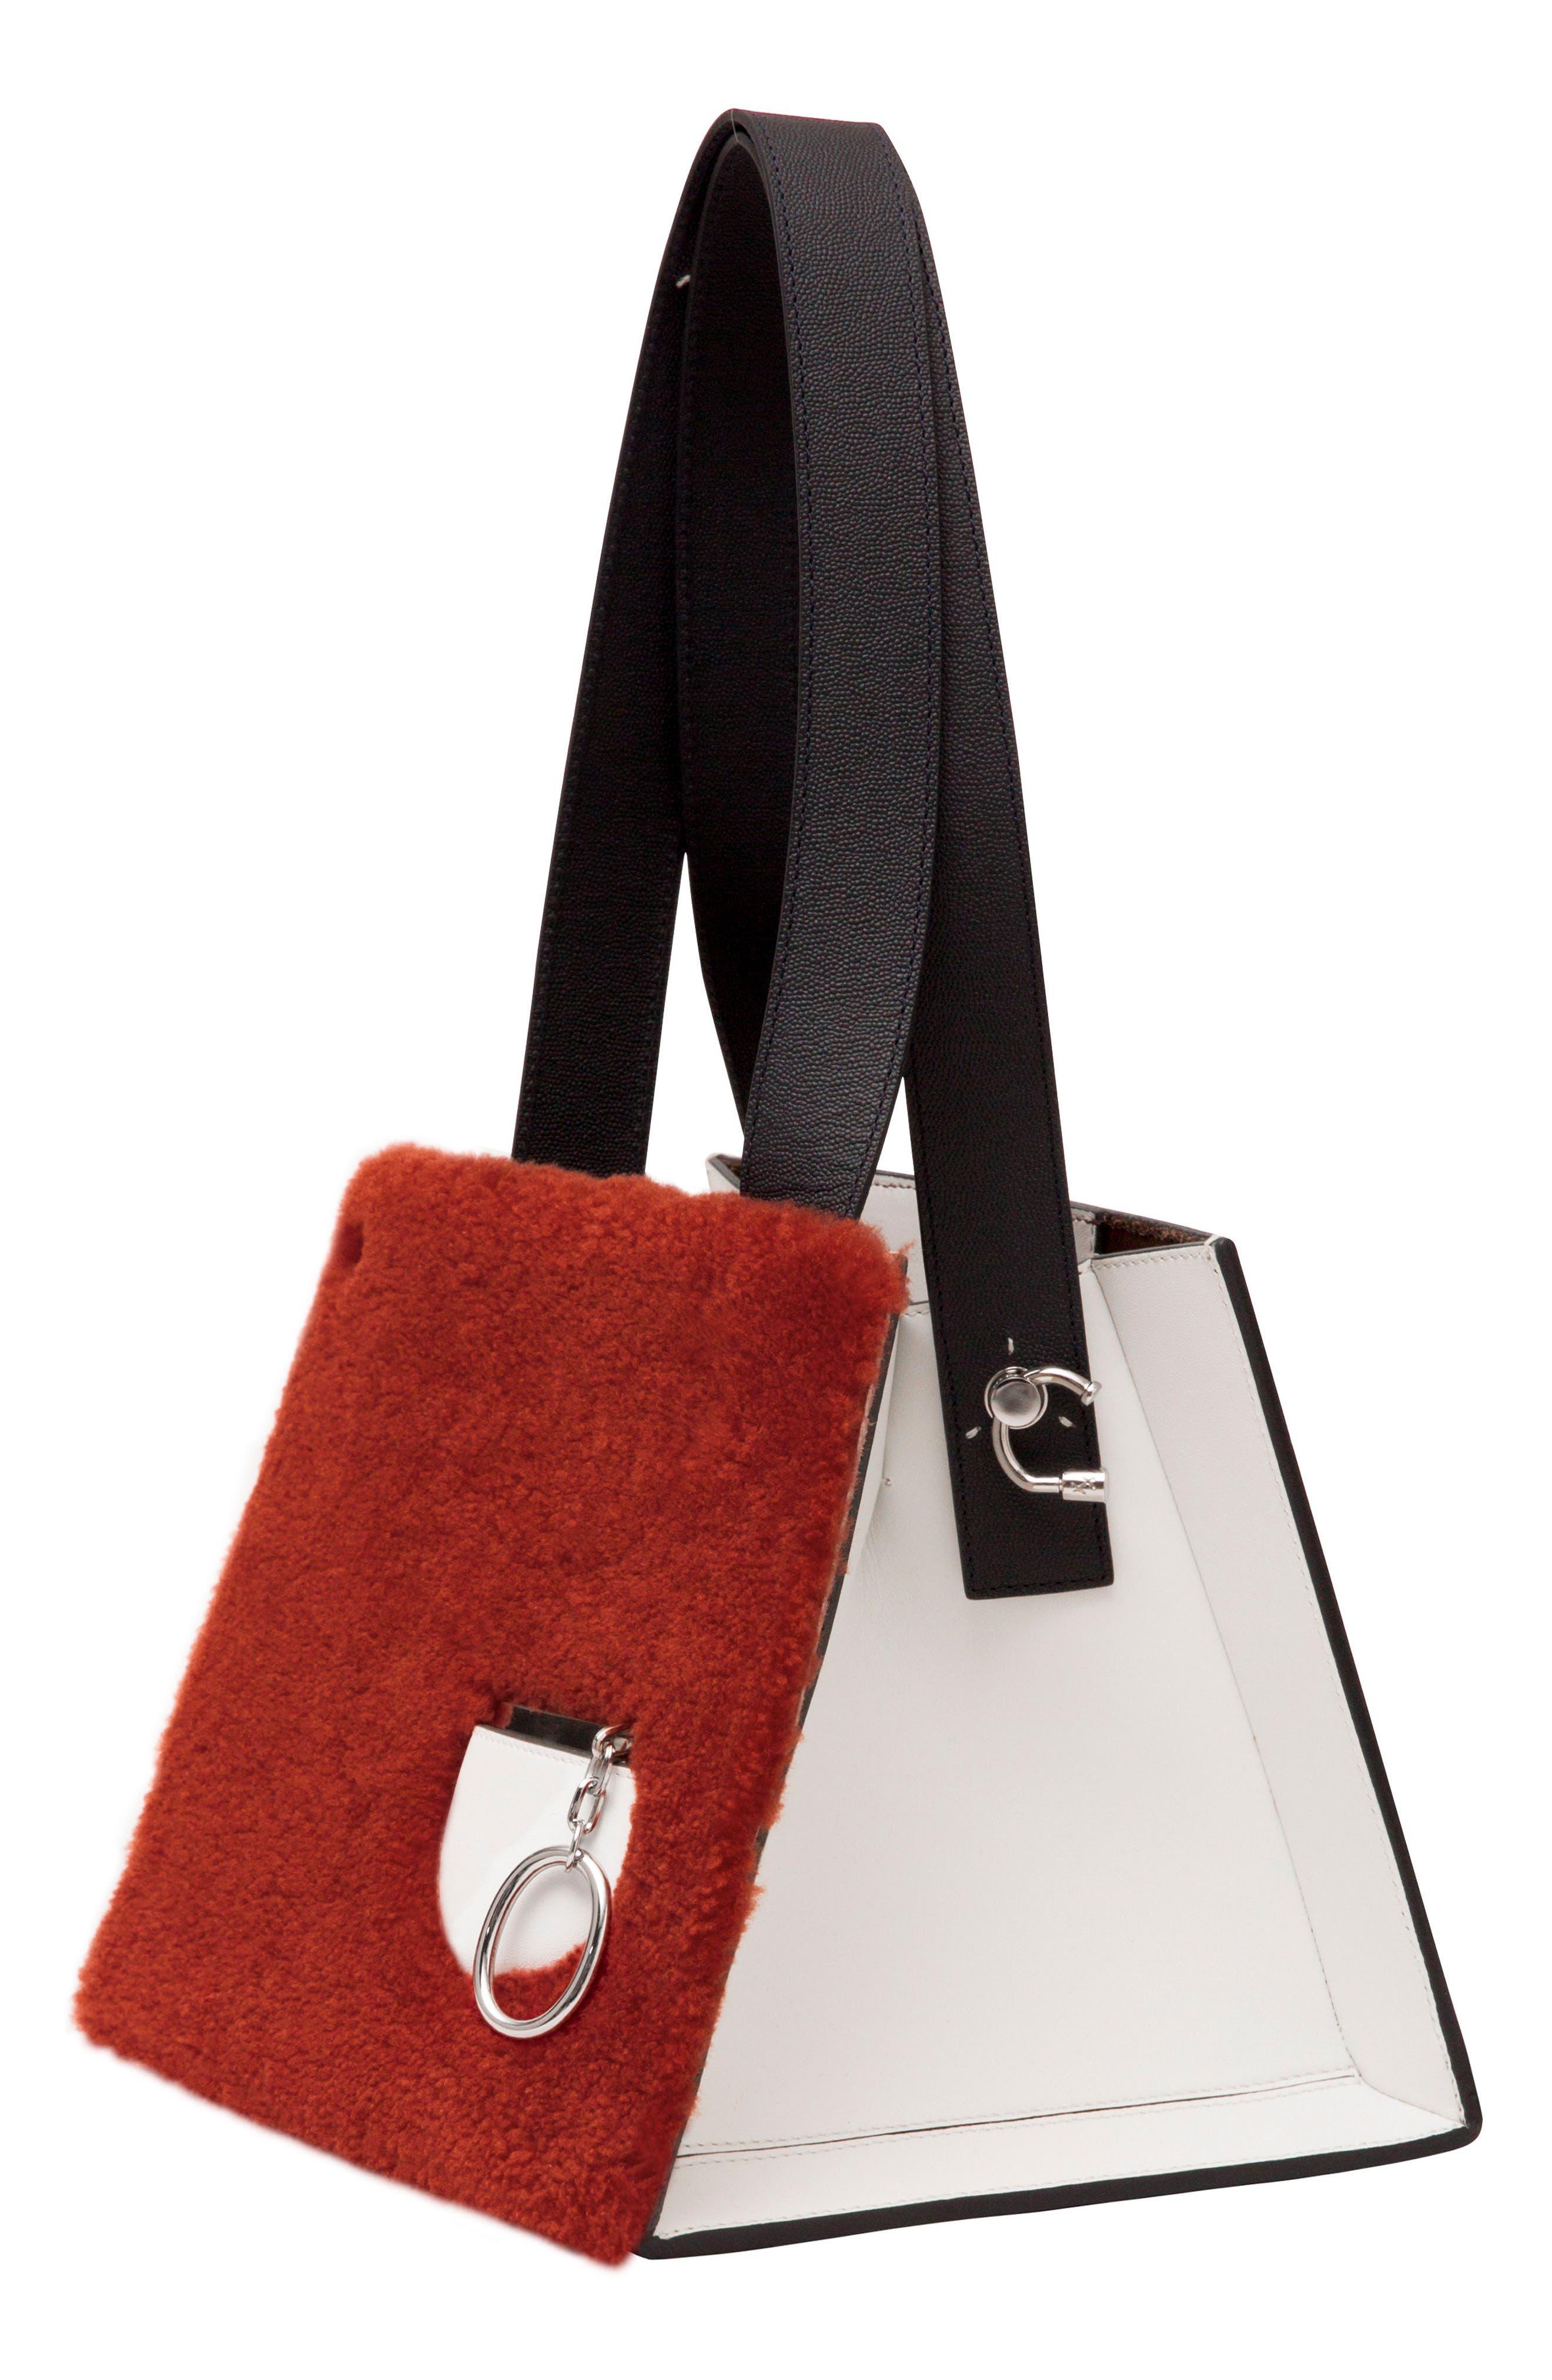 Margot Leather & Genuine Shearling Tote Bag,                             Alternate thumbnail 4, color,                             SHEARLING BRICK